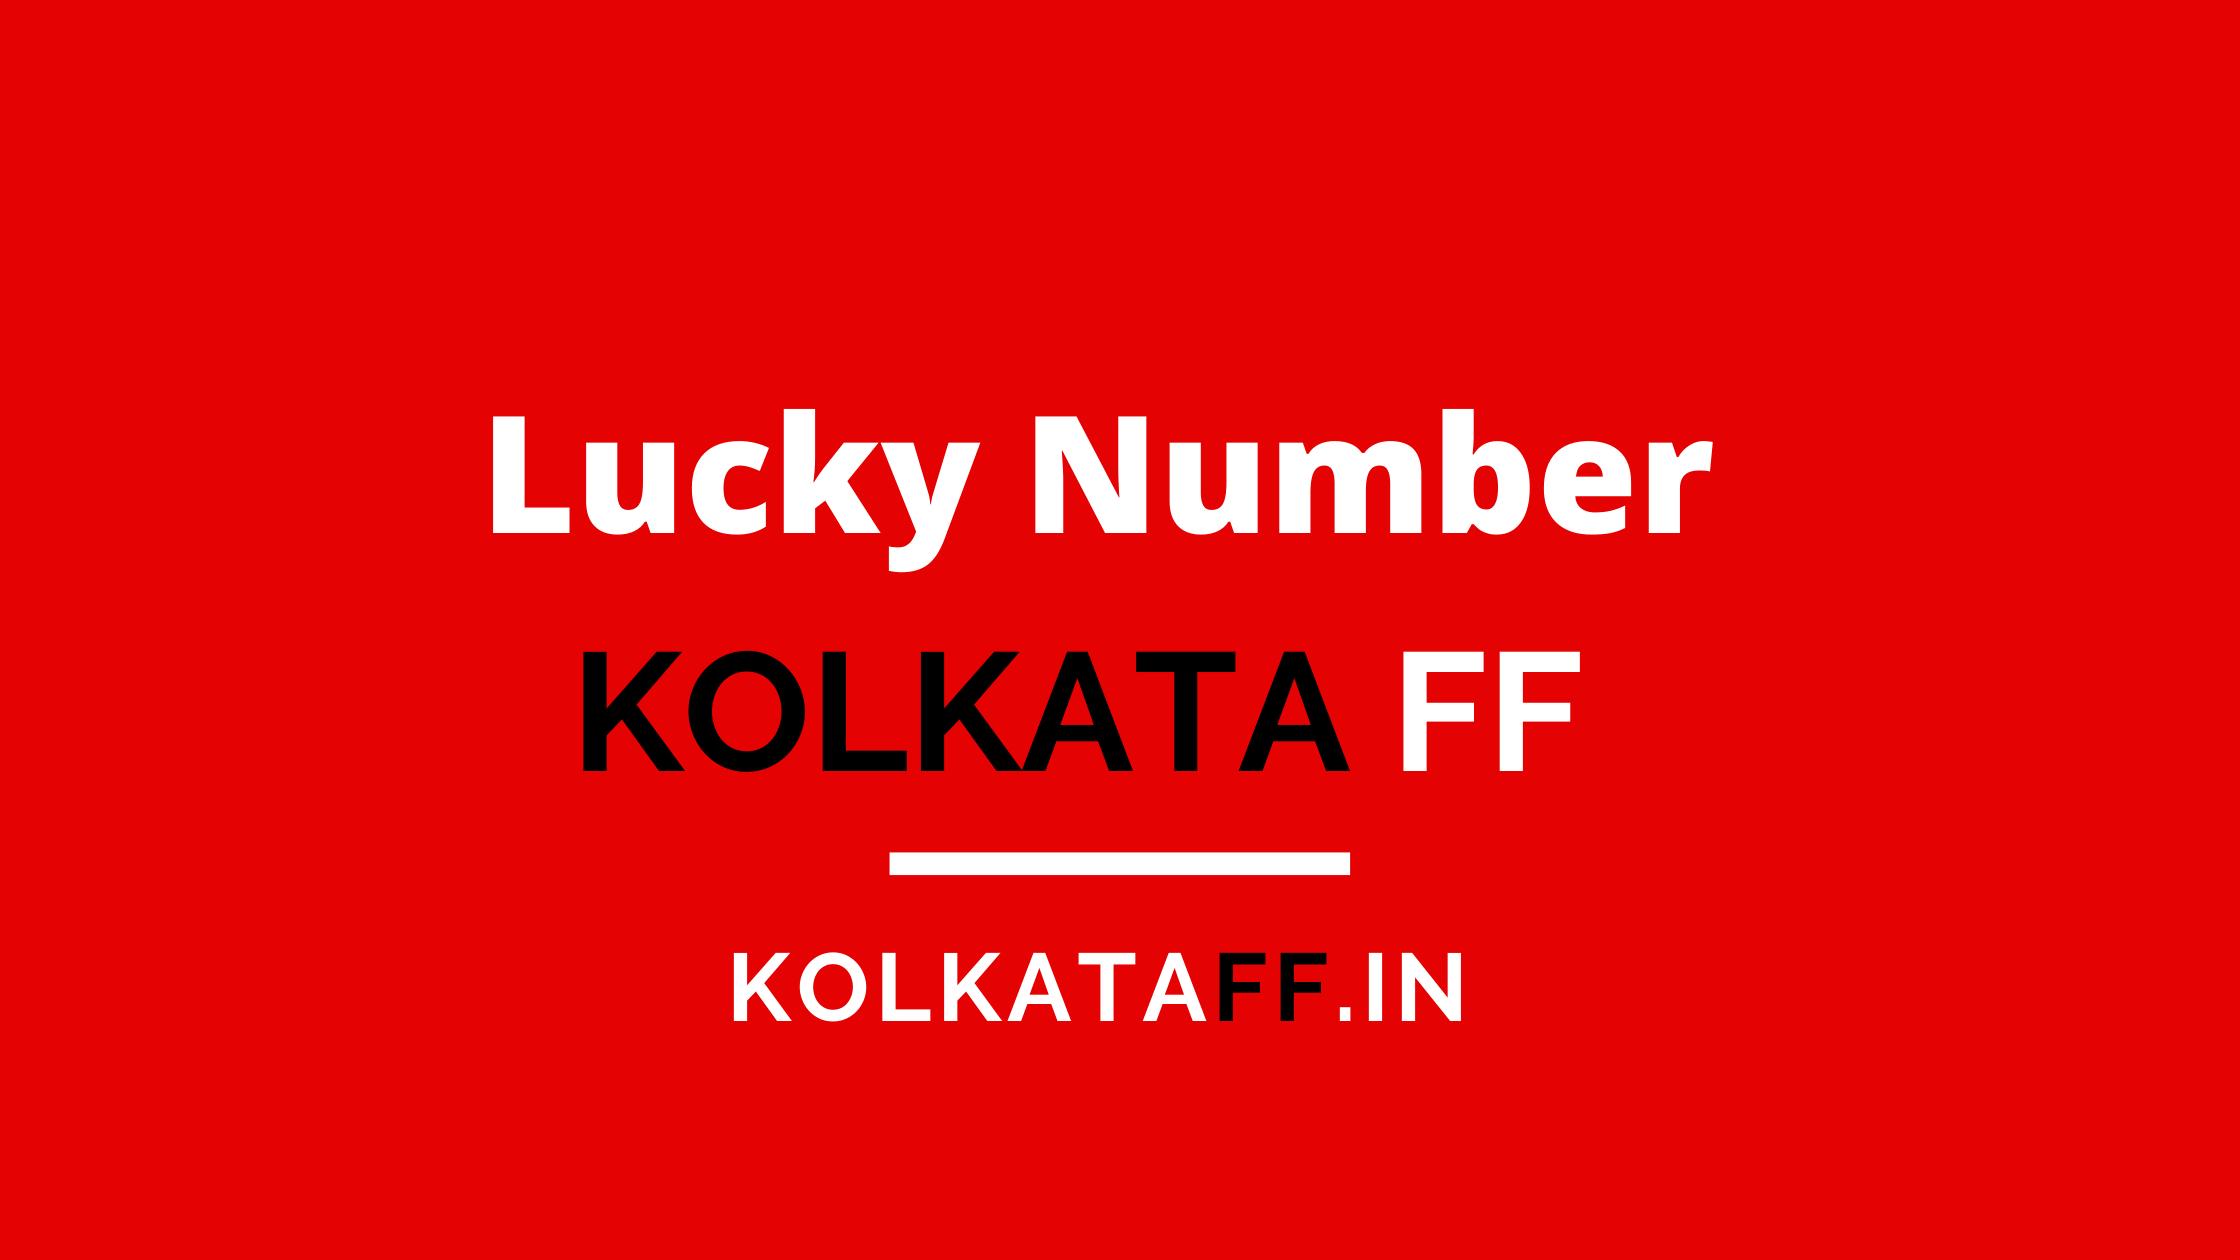 Kolkata FF Lucky Number